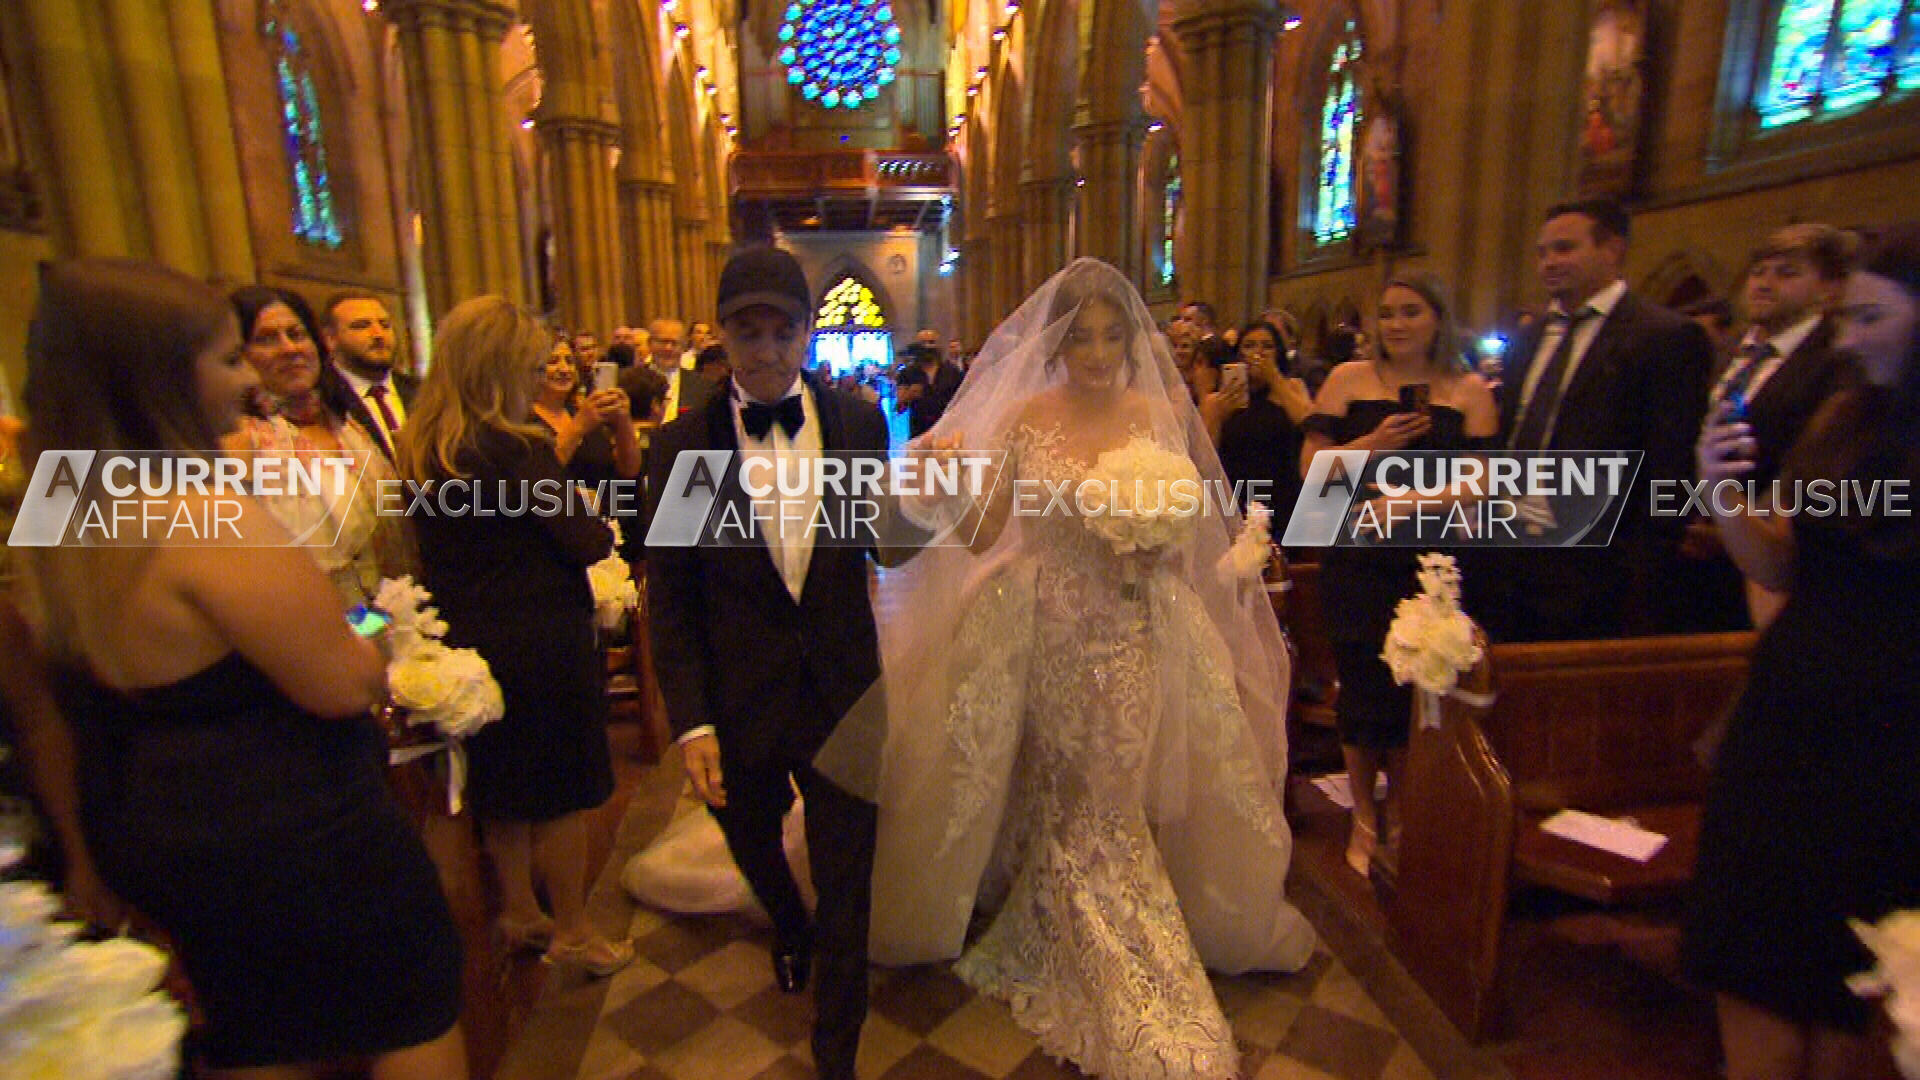 Exclusive: Jeff Fenech surprises daughter at Sydney wedding